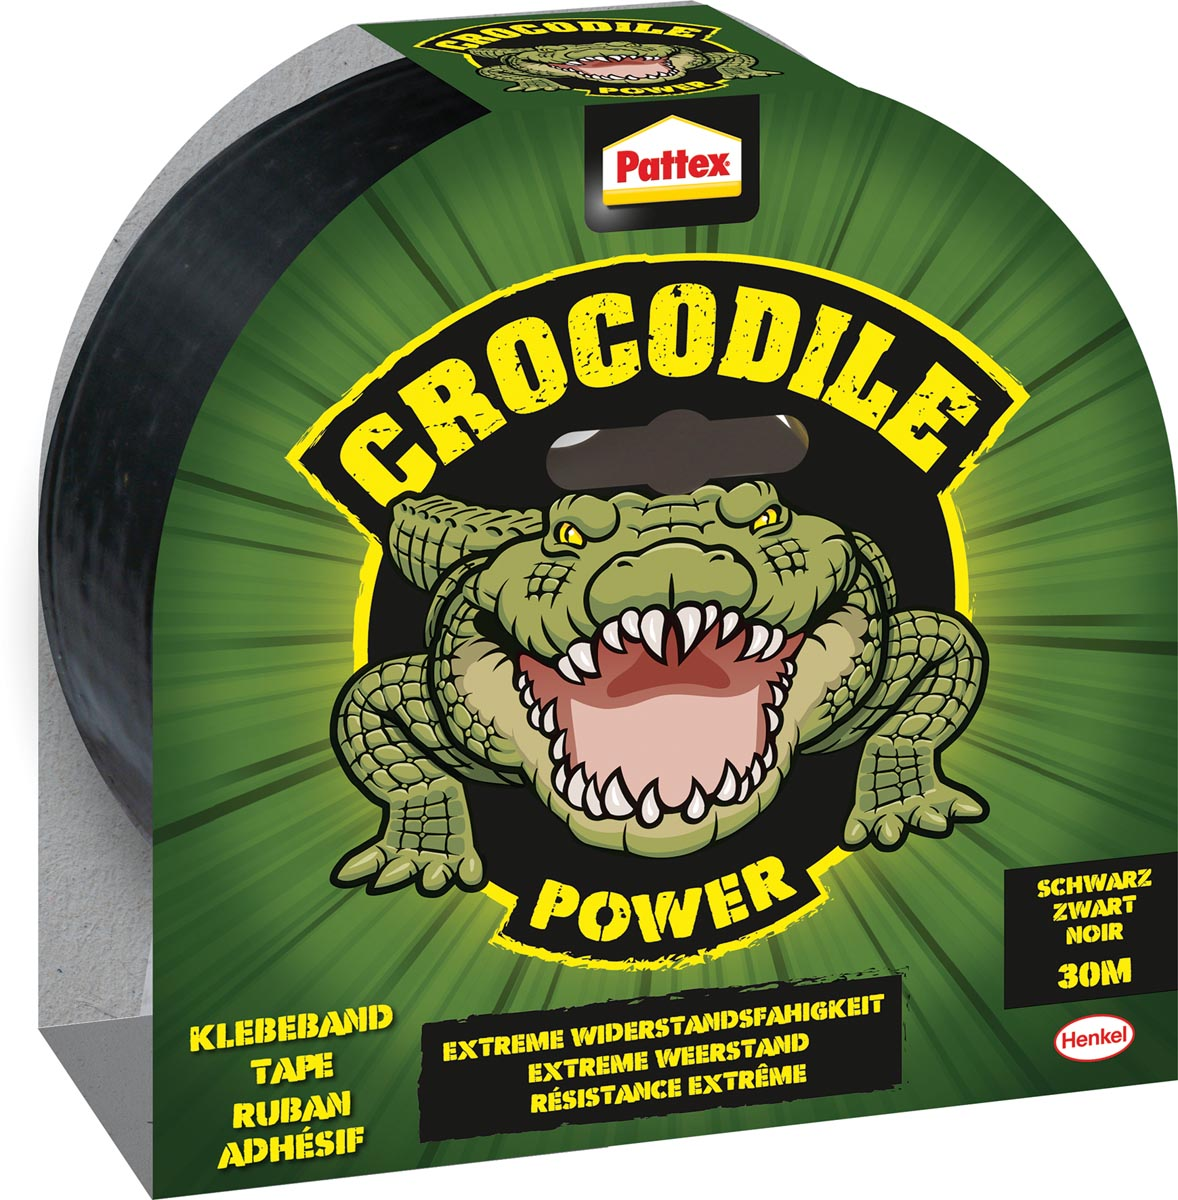 Pattex plakband Crocodile Power Tape lengte: 30 m, zwart